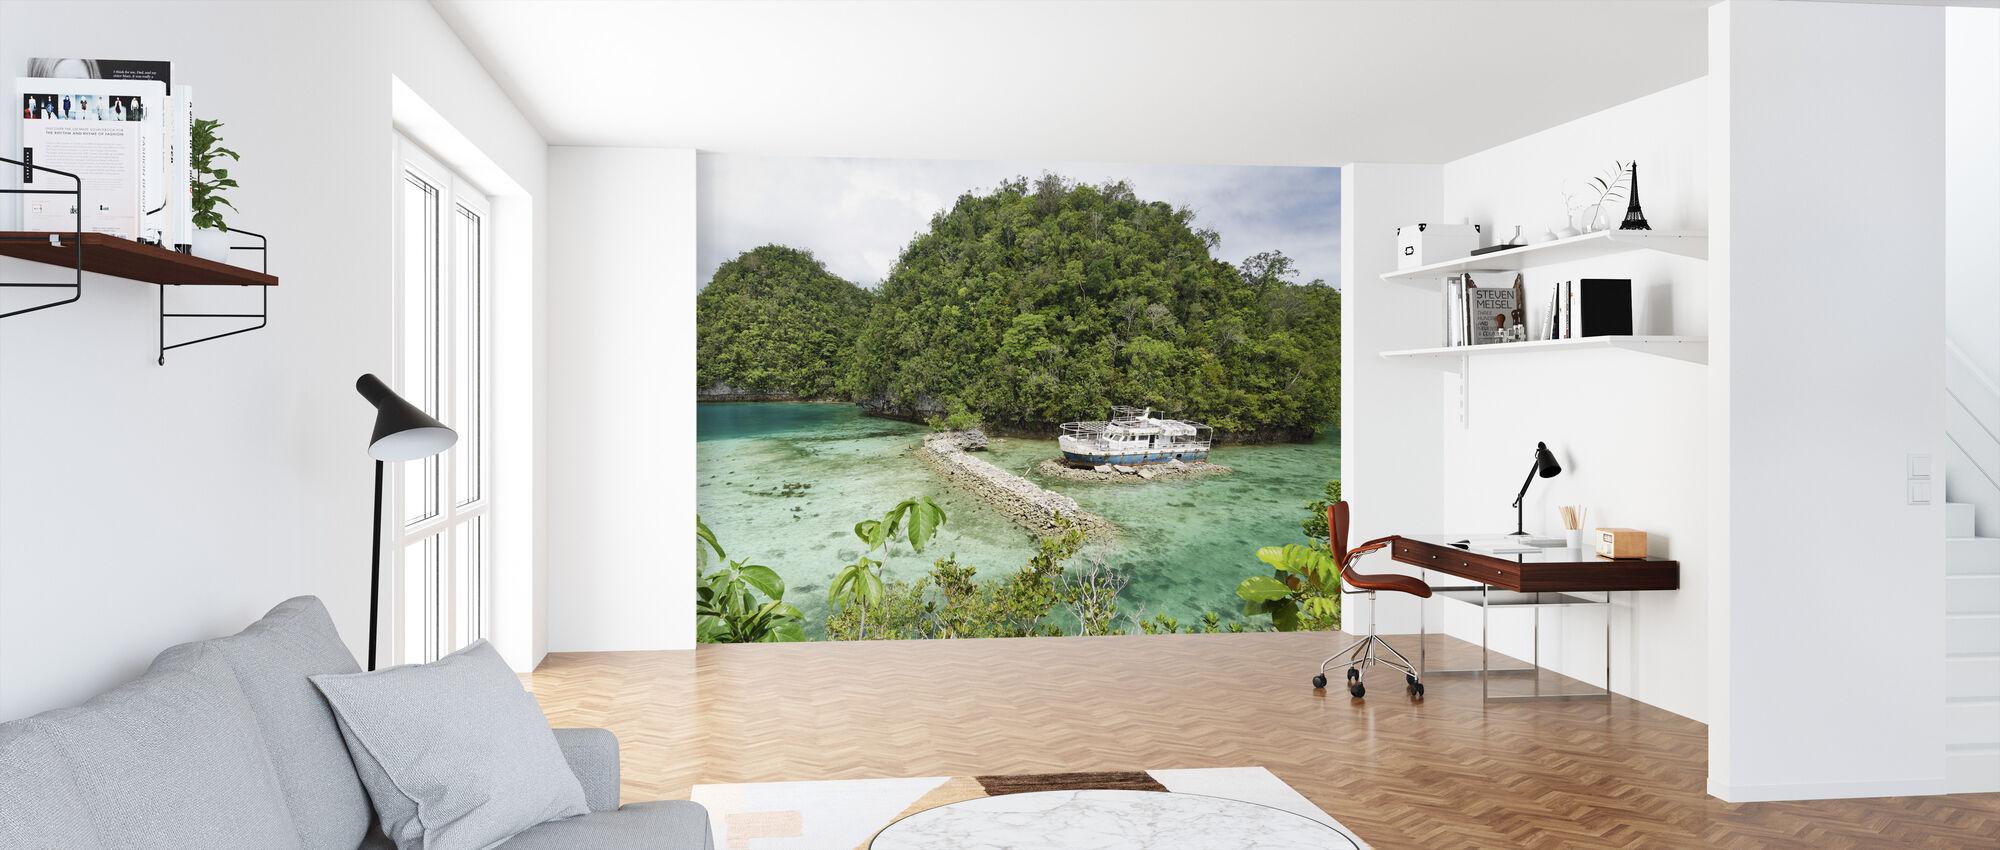 Boat Wreck at Bucas Grande - Wallpaper - Office